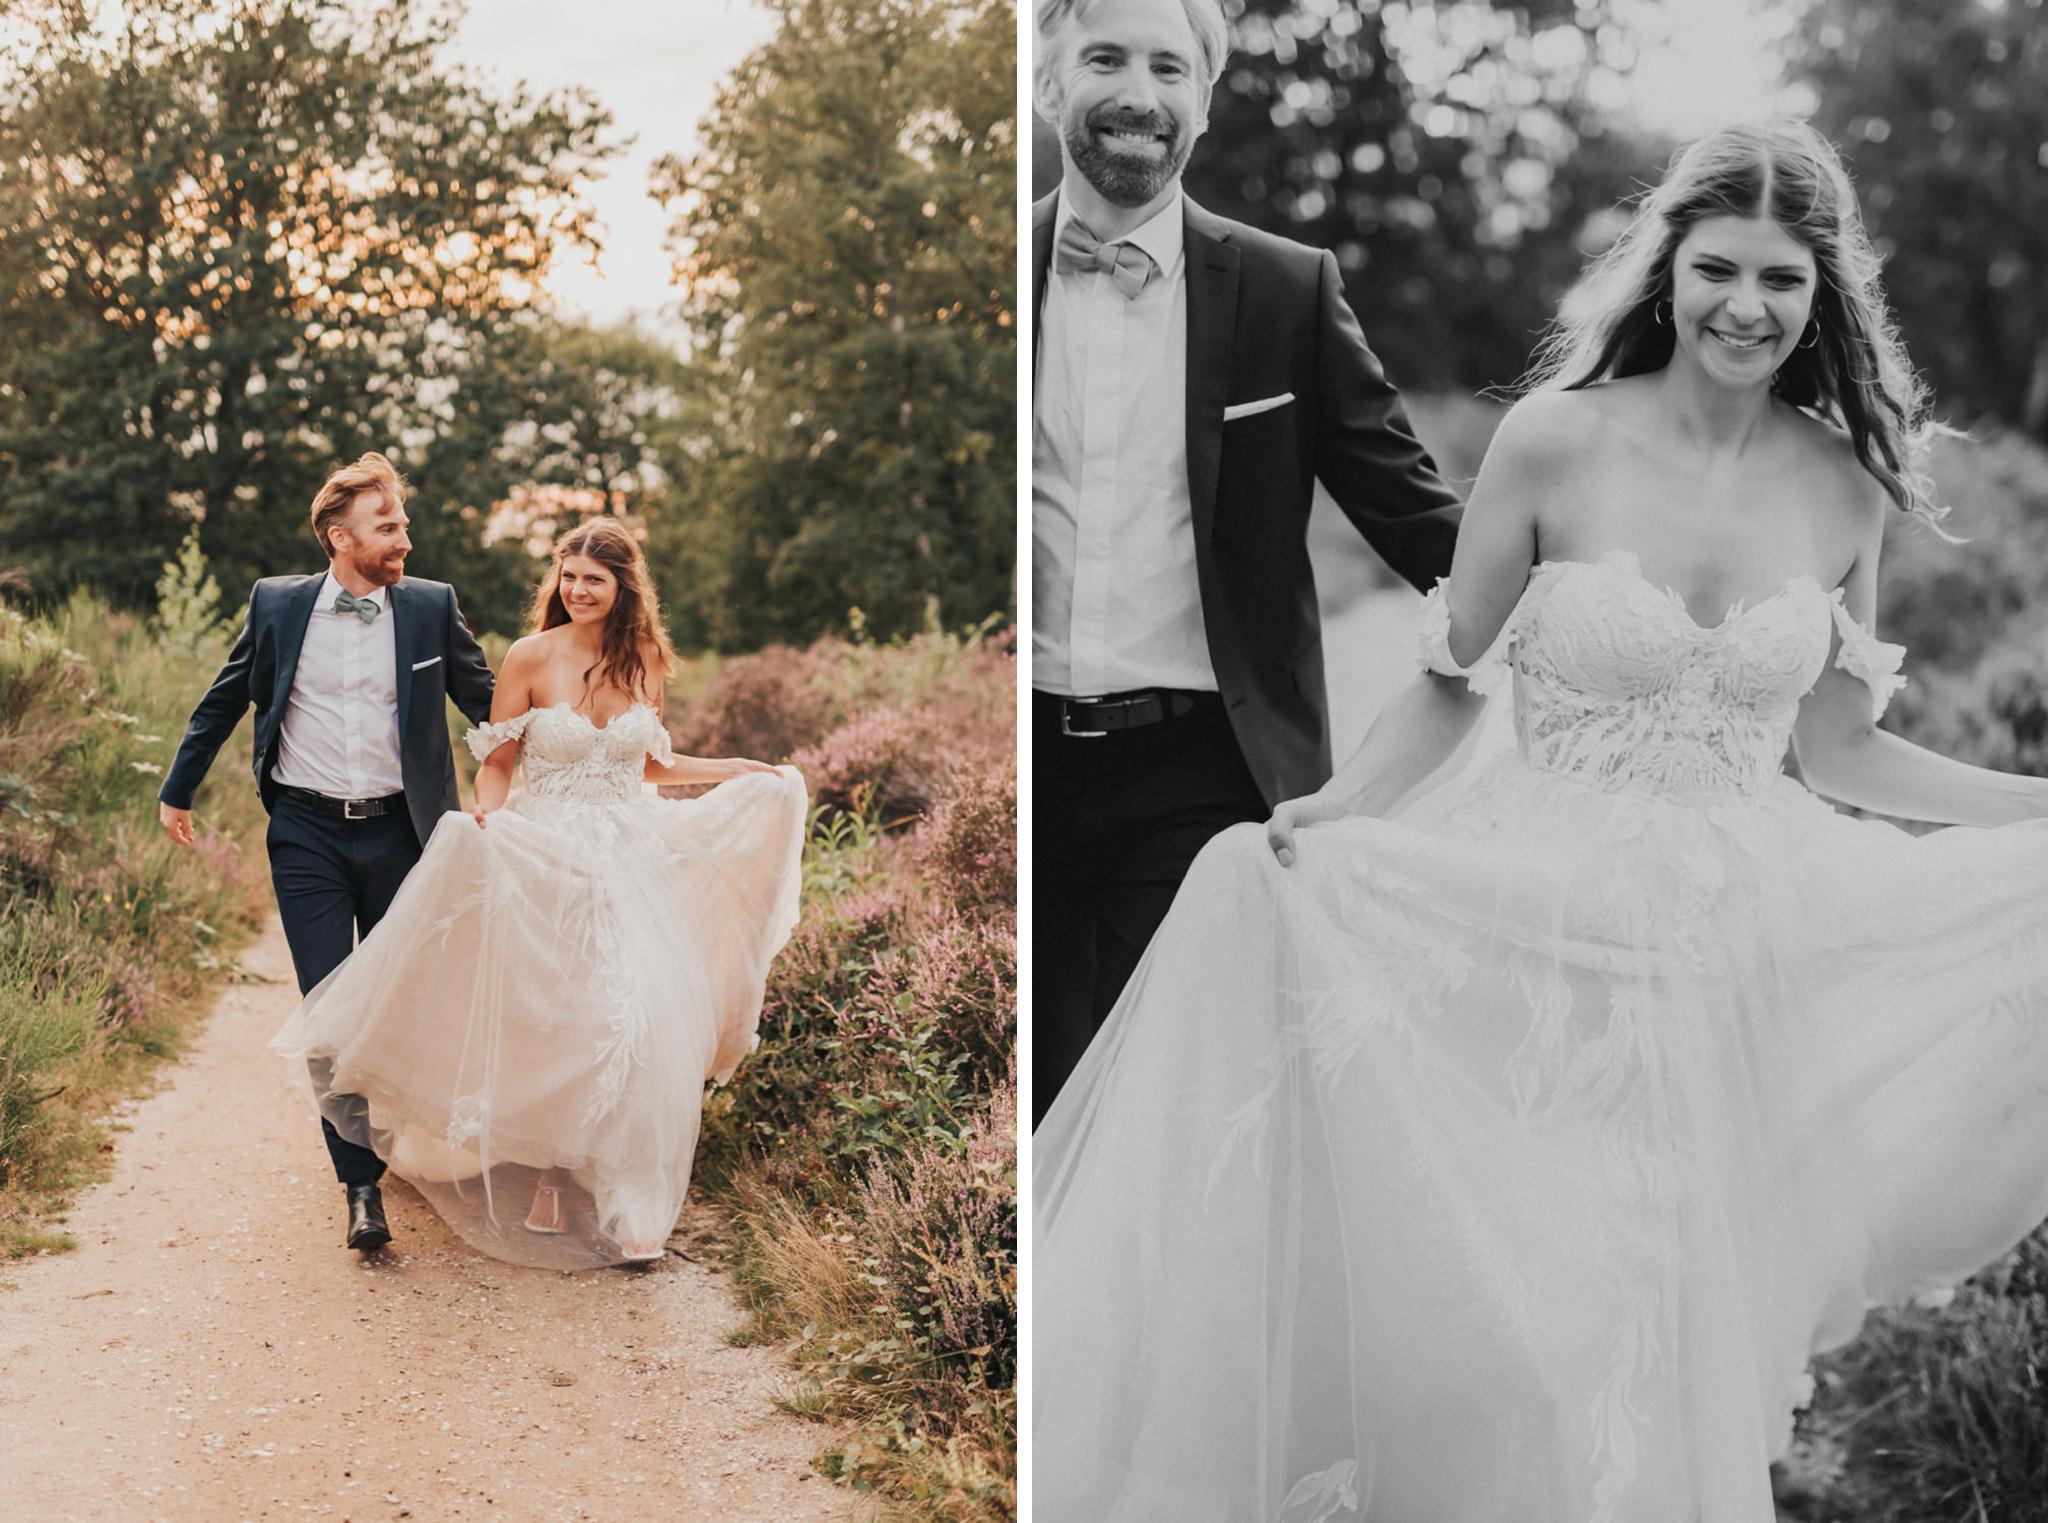 Hochzeitsfotograf Köln, Hochzeitfotograf Bonn, After-Wedding-Shooting Wahner Heide